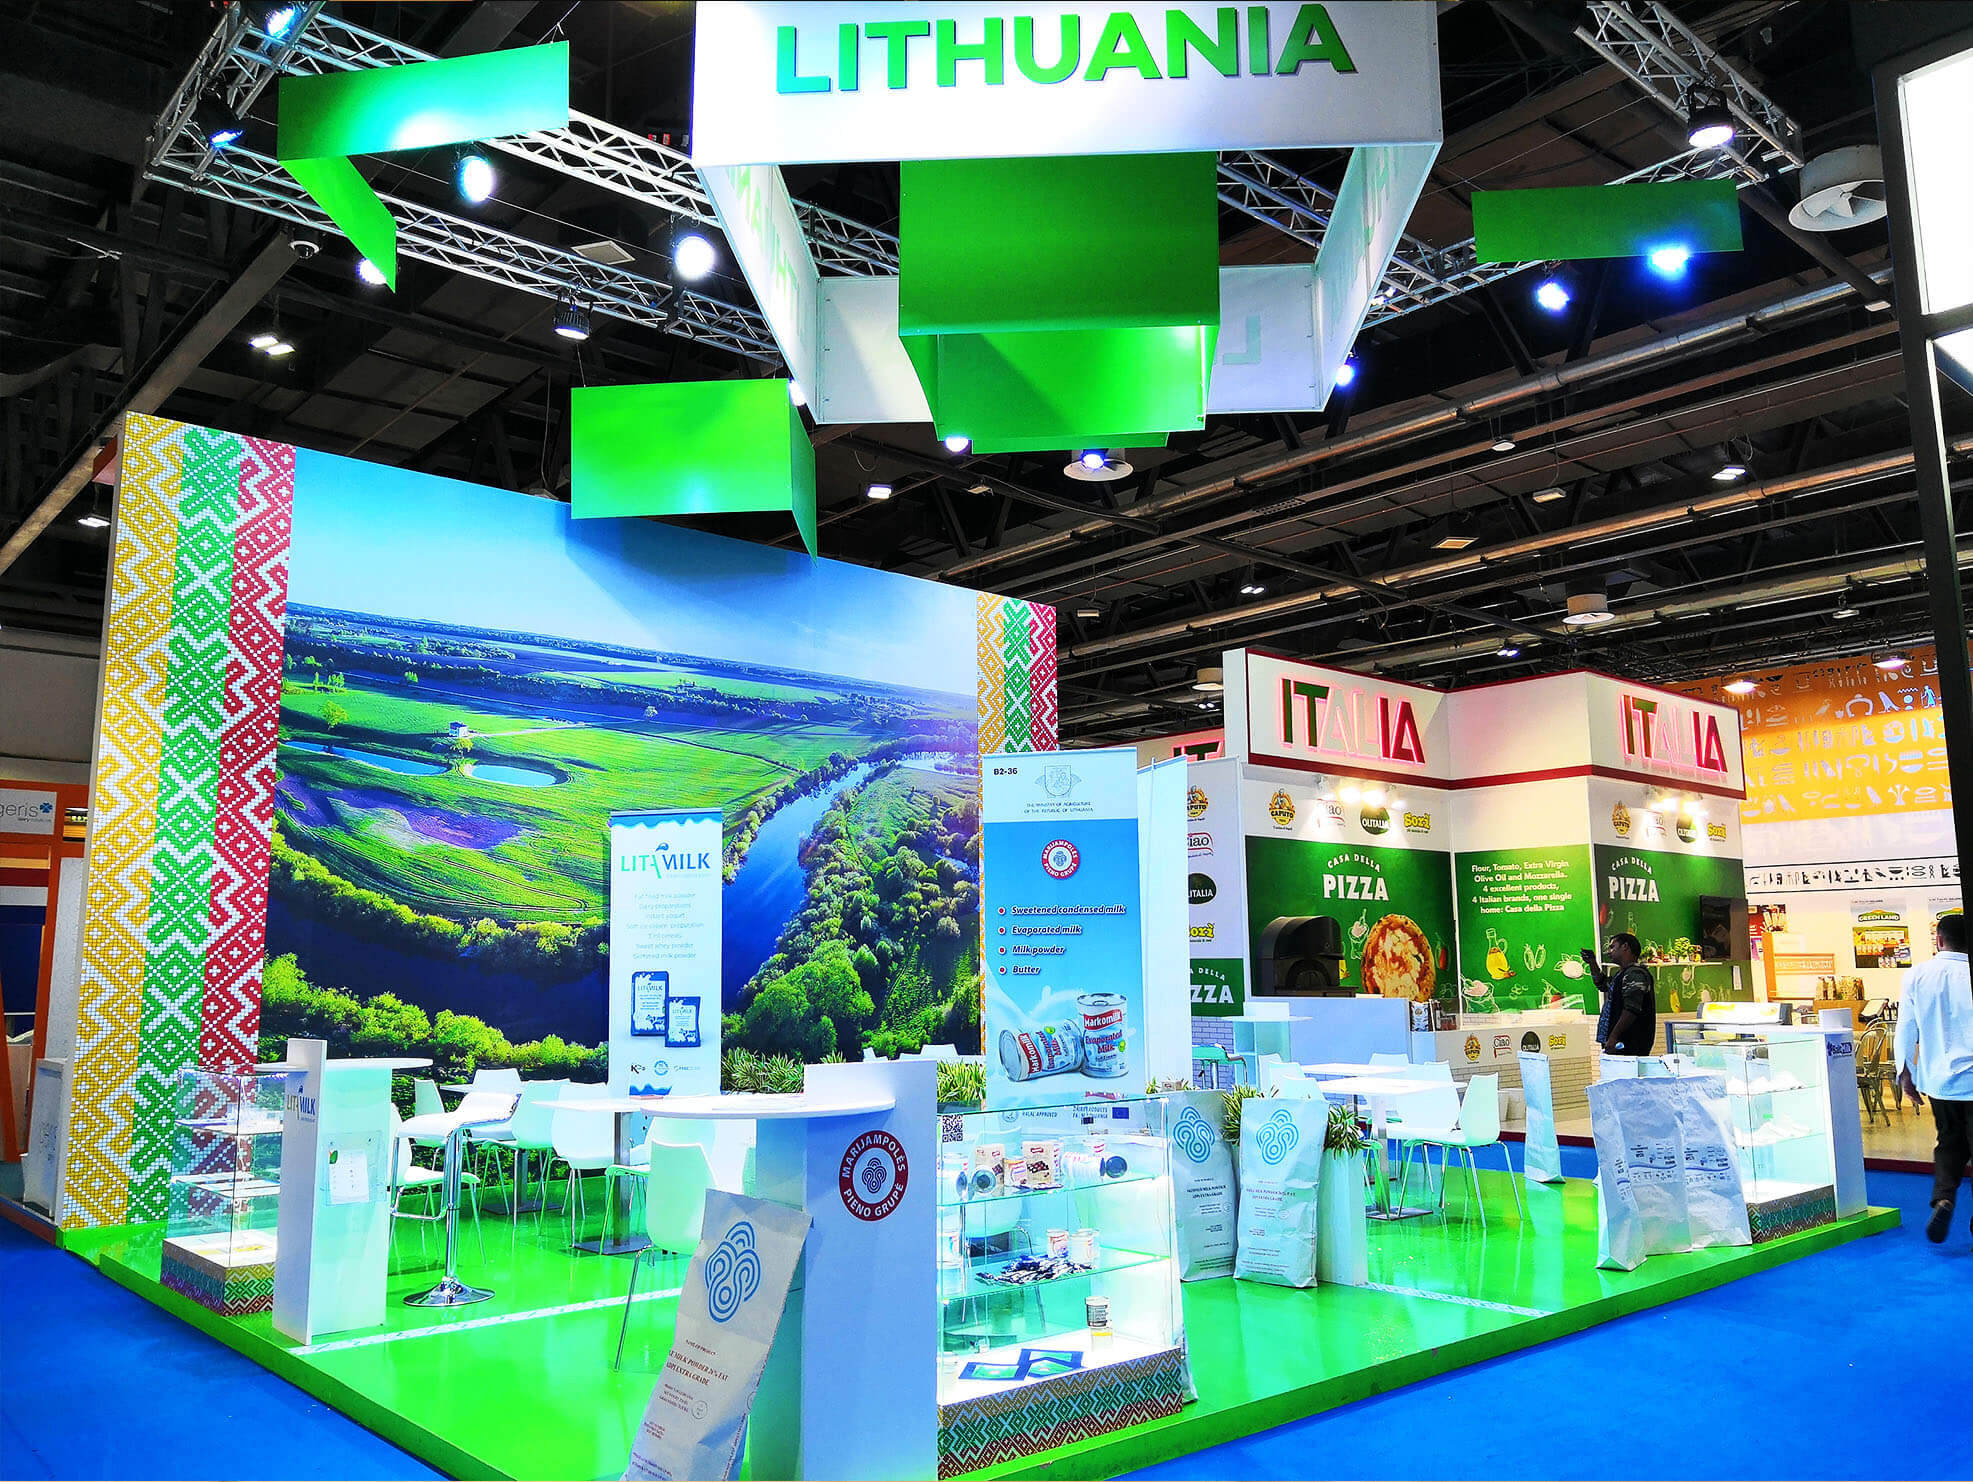 Lithuania's trade show booth design